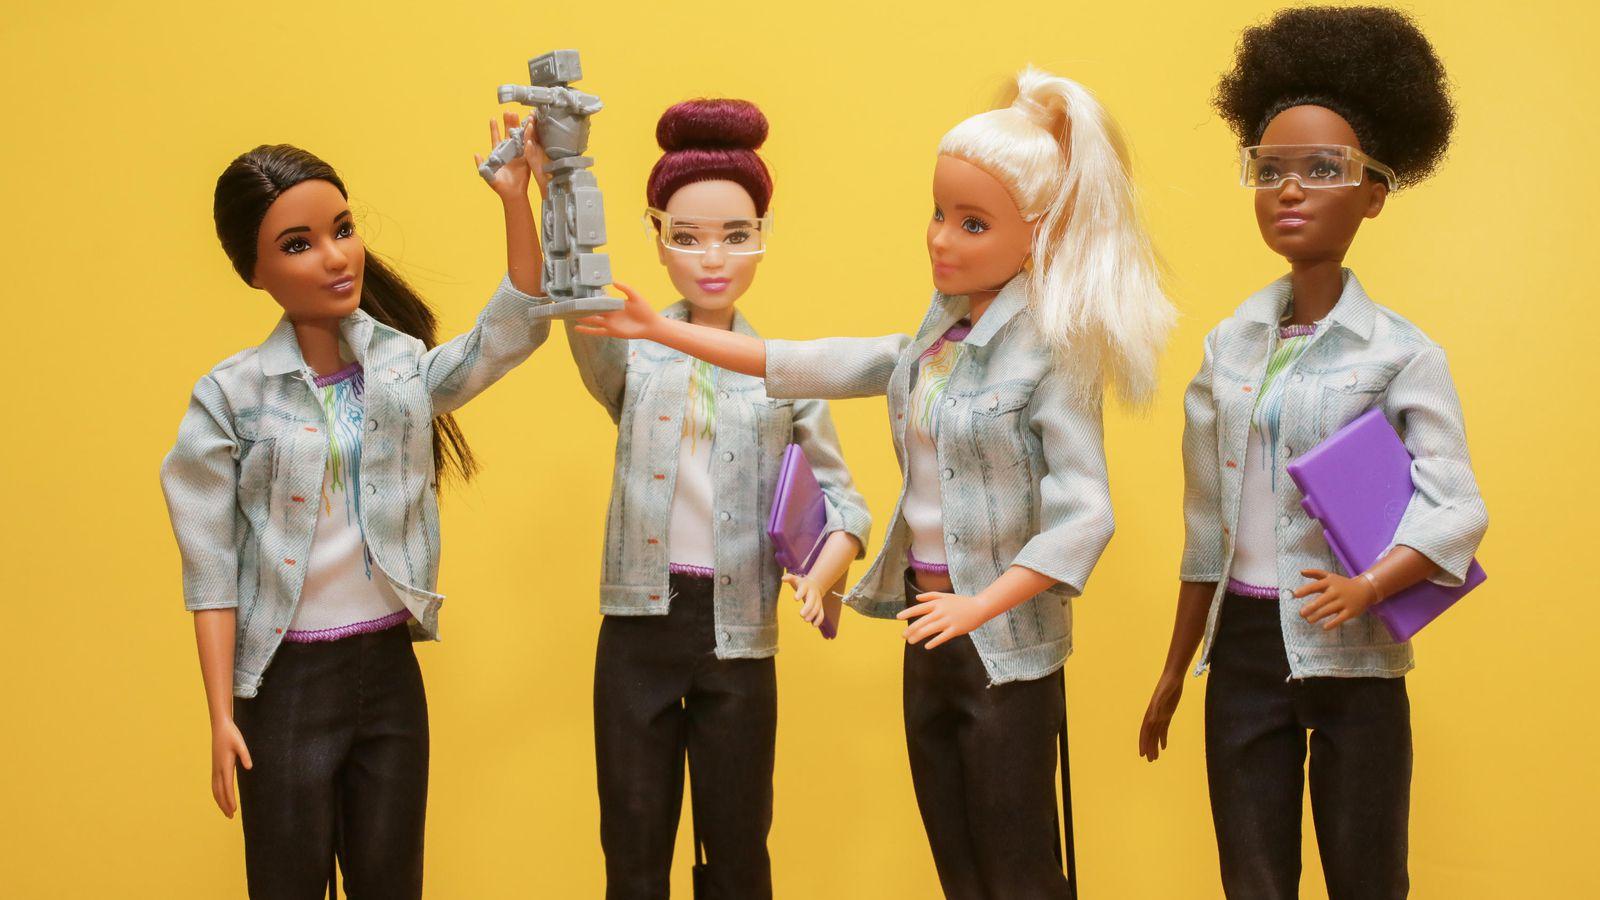 Robotics Engineer Barbie Wants To Encourage Girls Into Stem